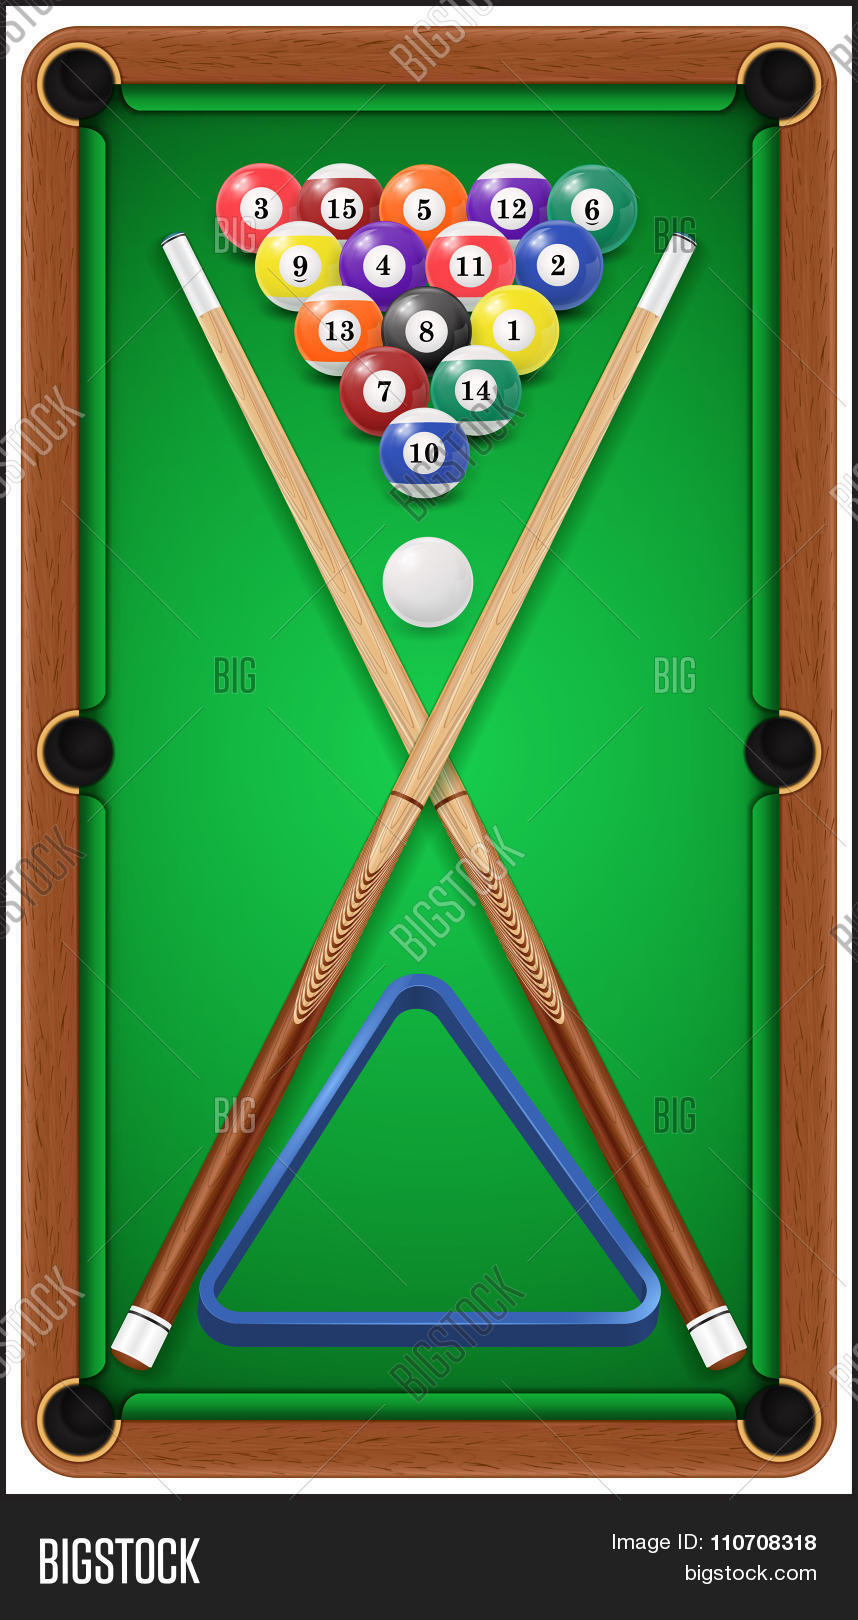 Billiard Set. Billard Balls, Cue And Billiard Triangle In A Pool Table.  Vector